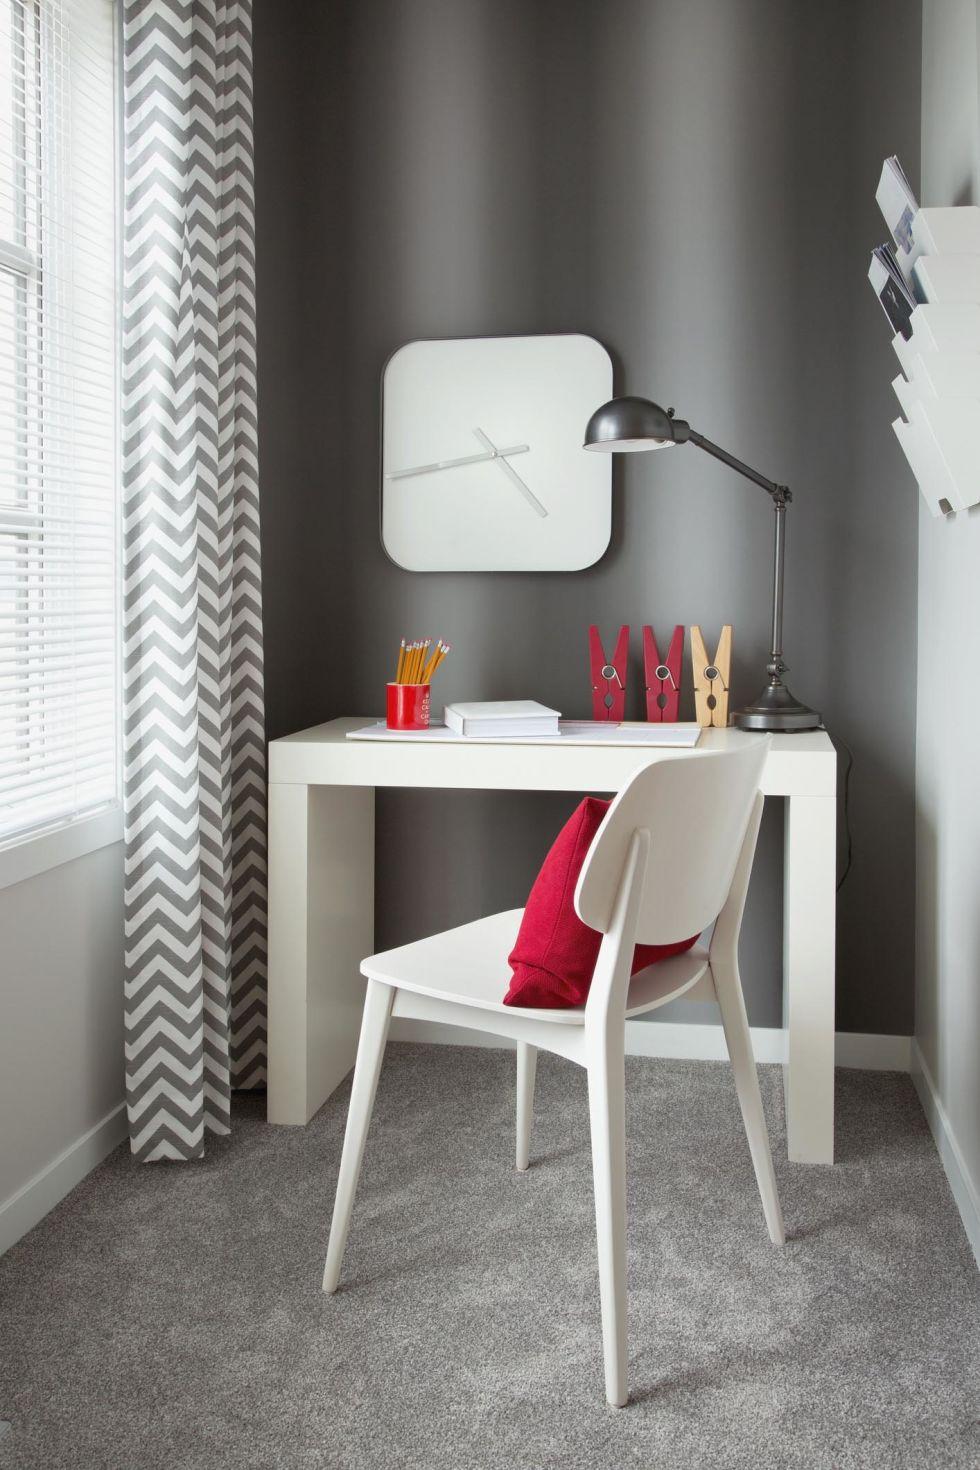 designers least favorite colors colors interior designers